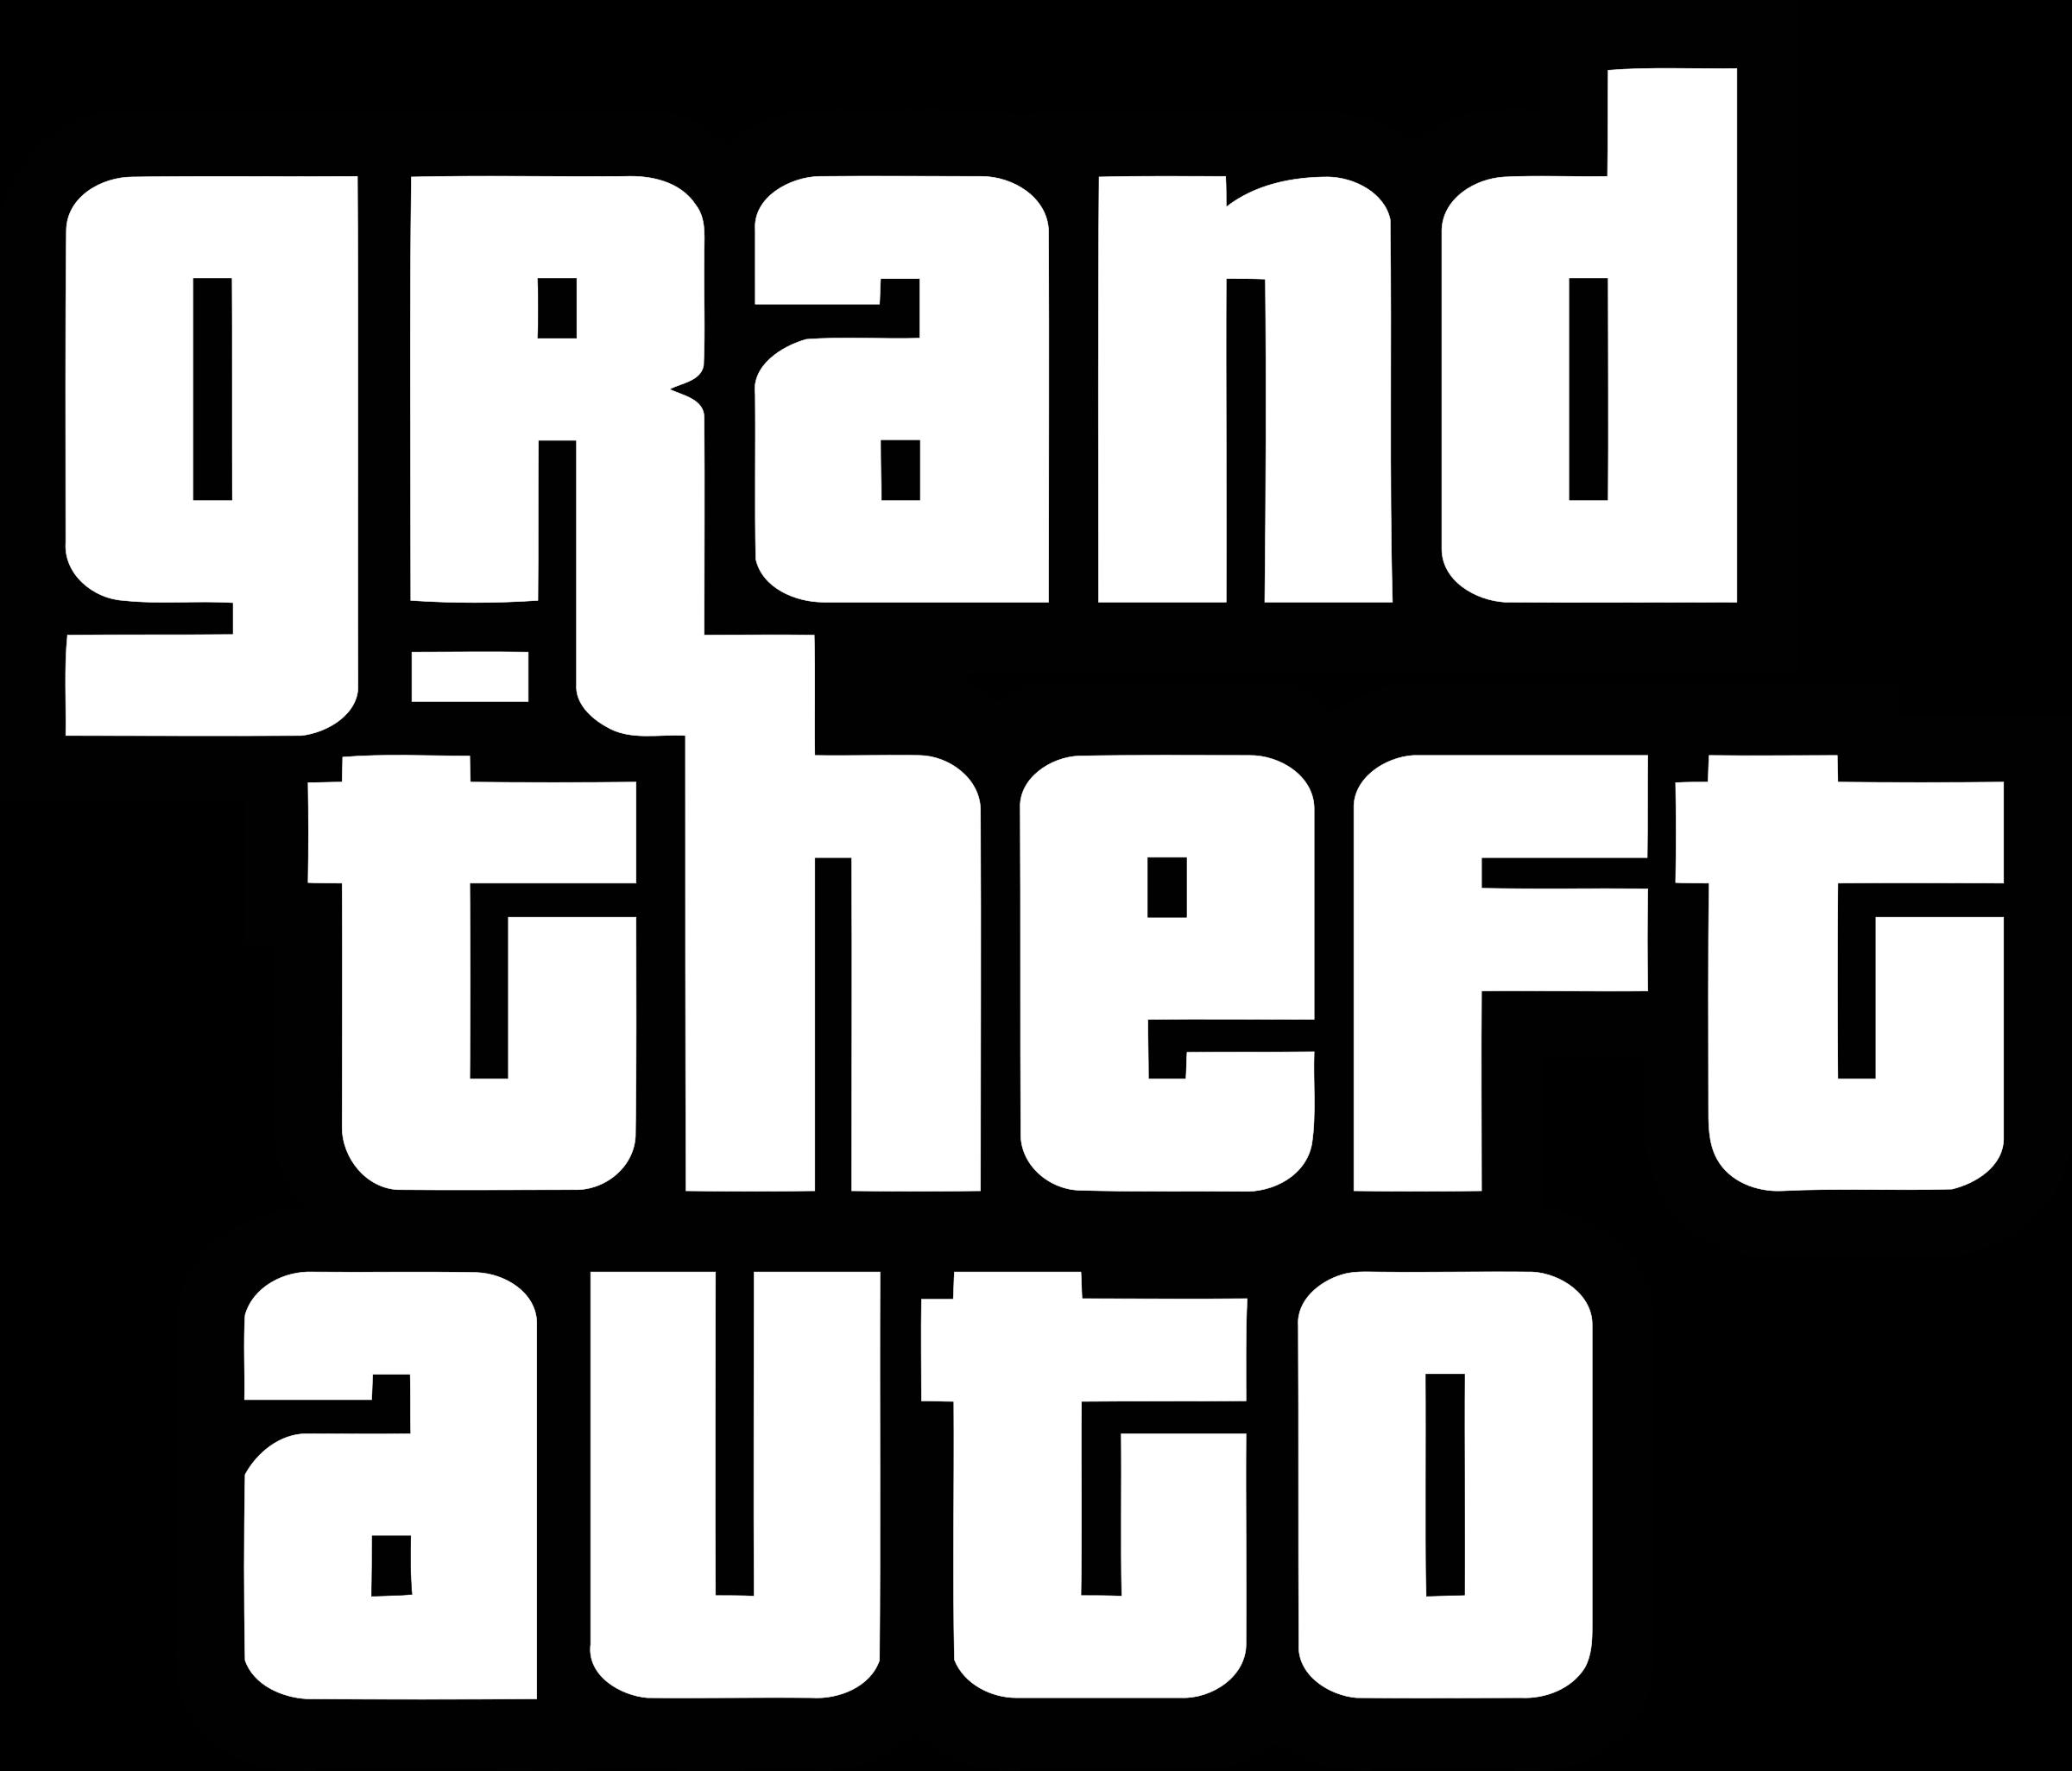 Gta Grand Theft Auto Logo Png Transparent Svg Vector Freebie Supply